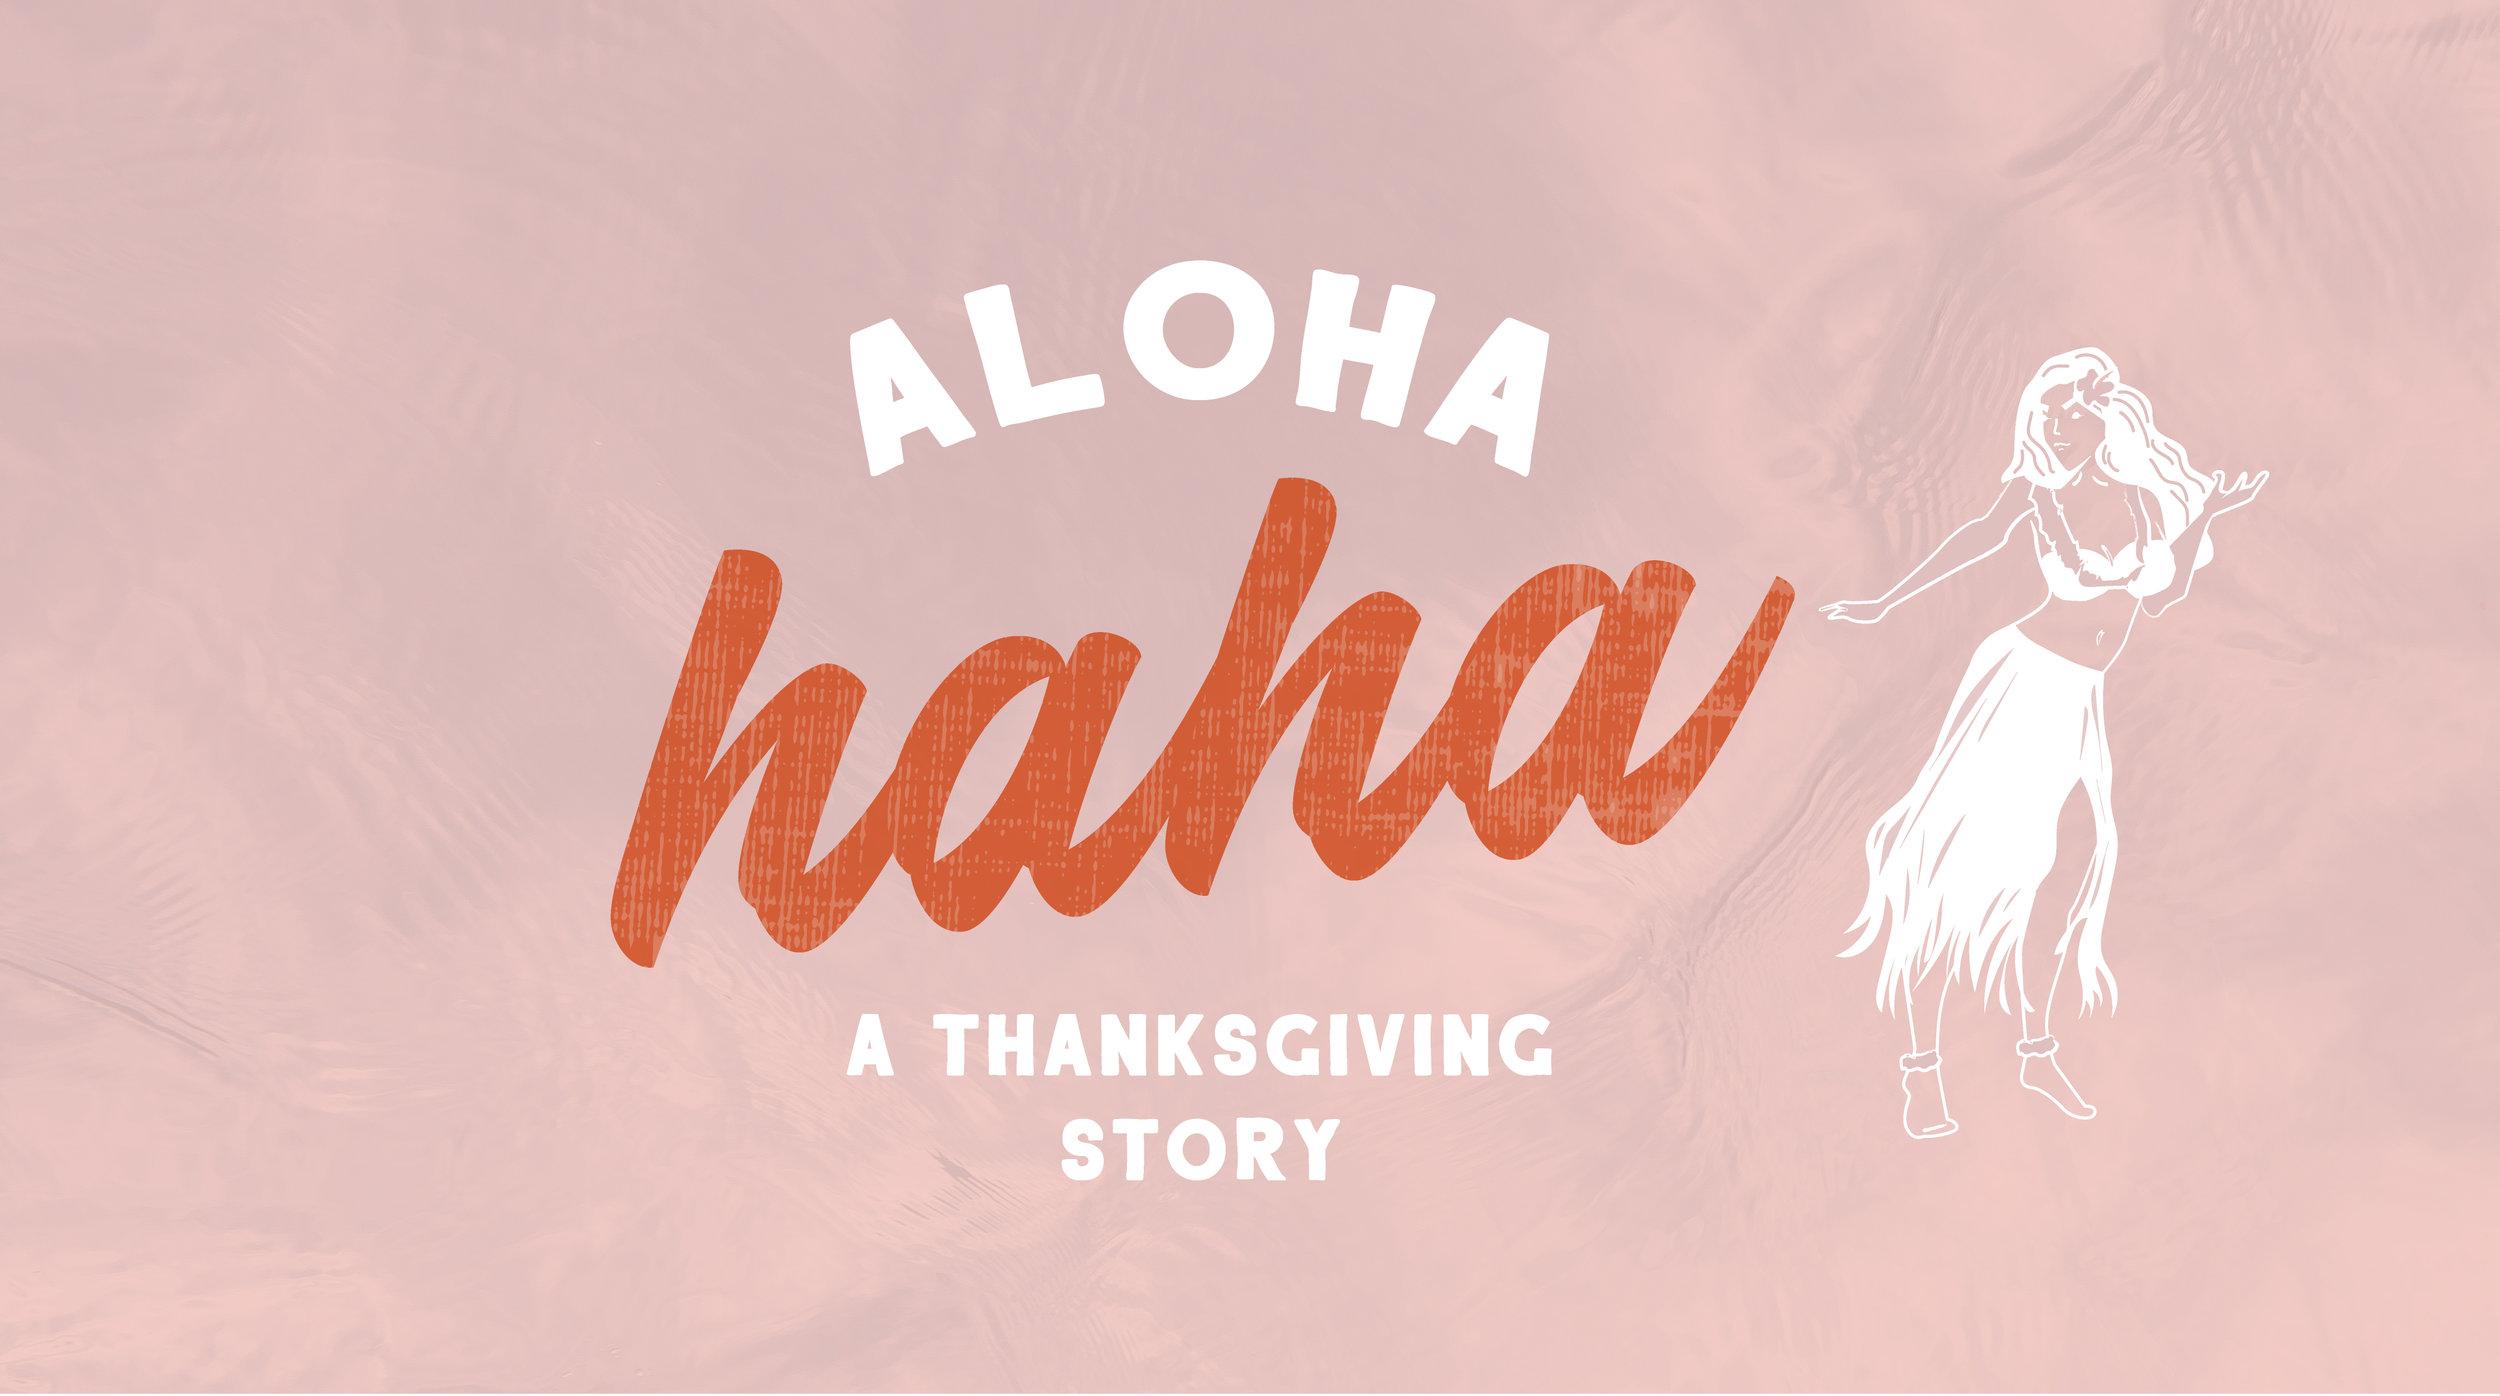 aloha-haha.jpg